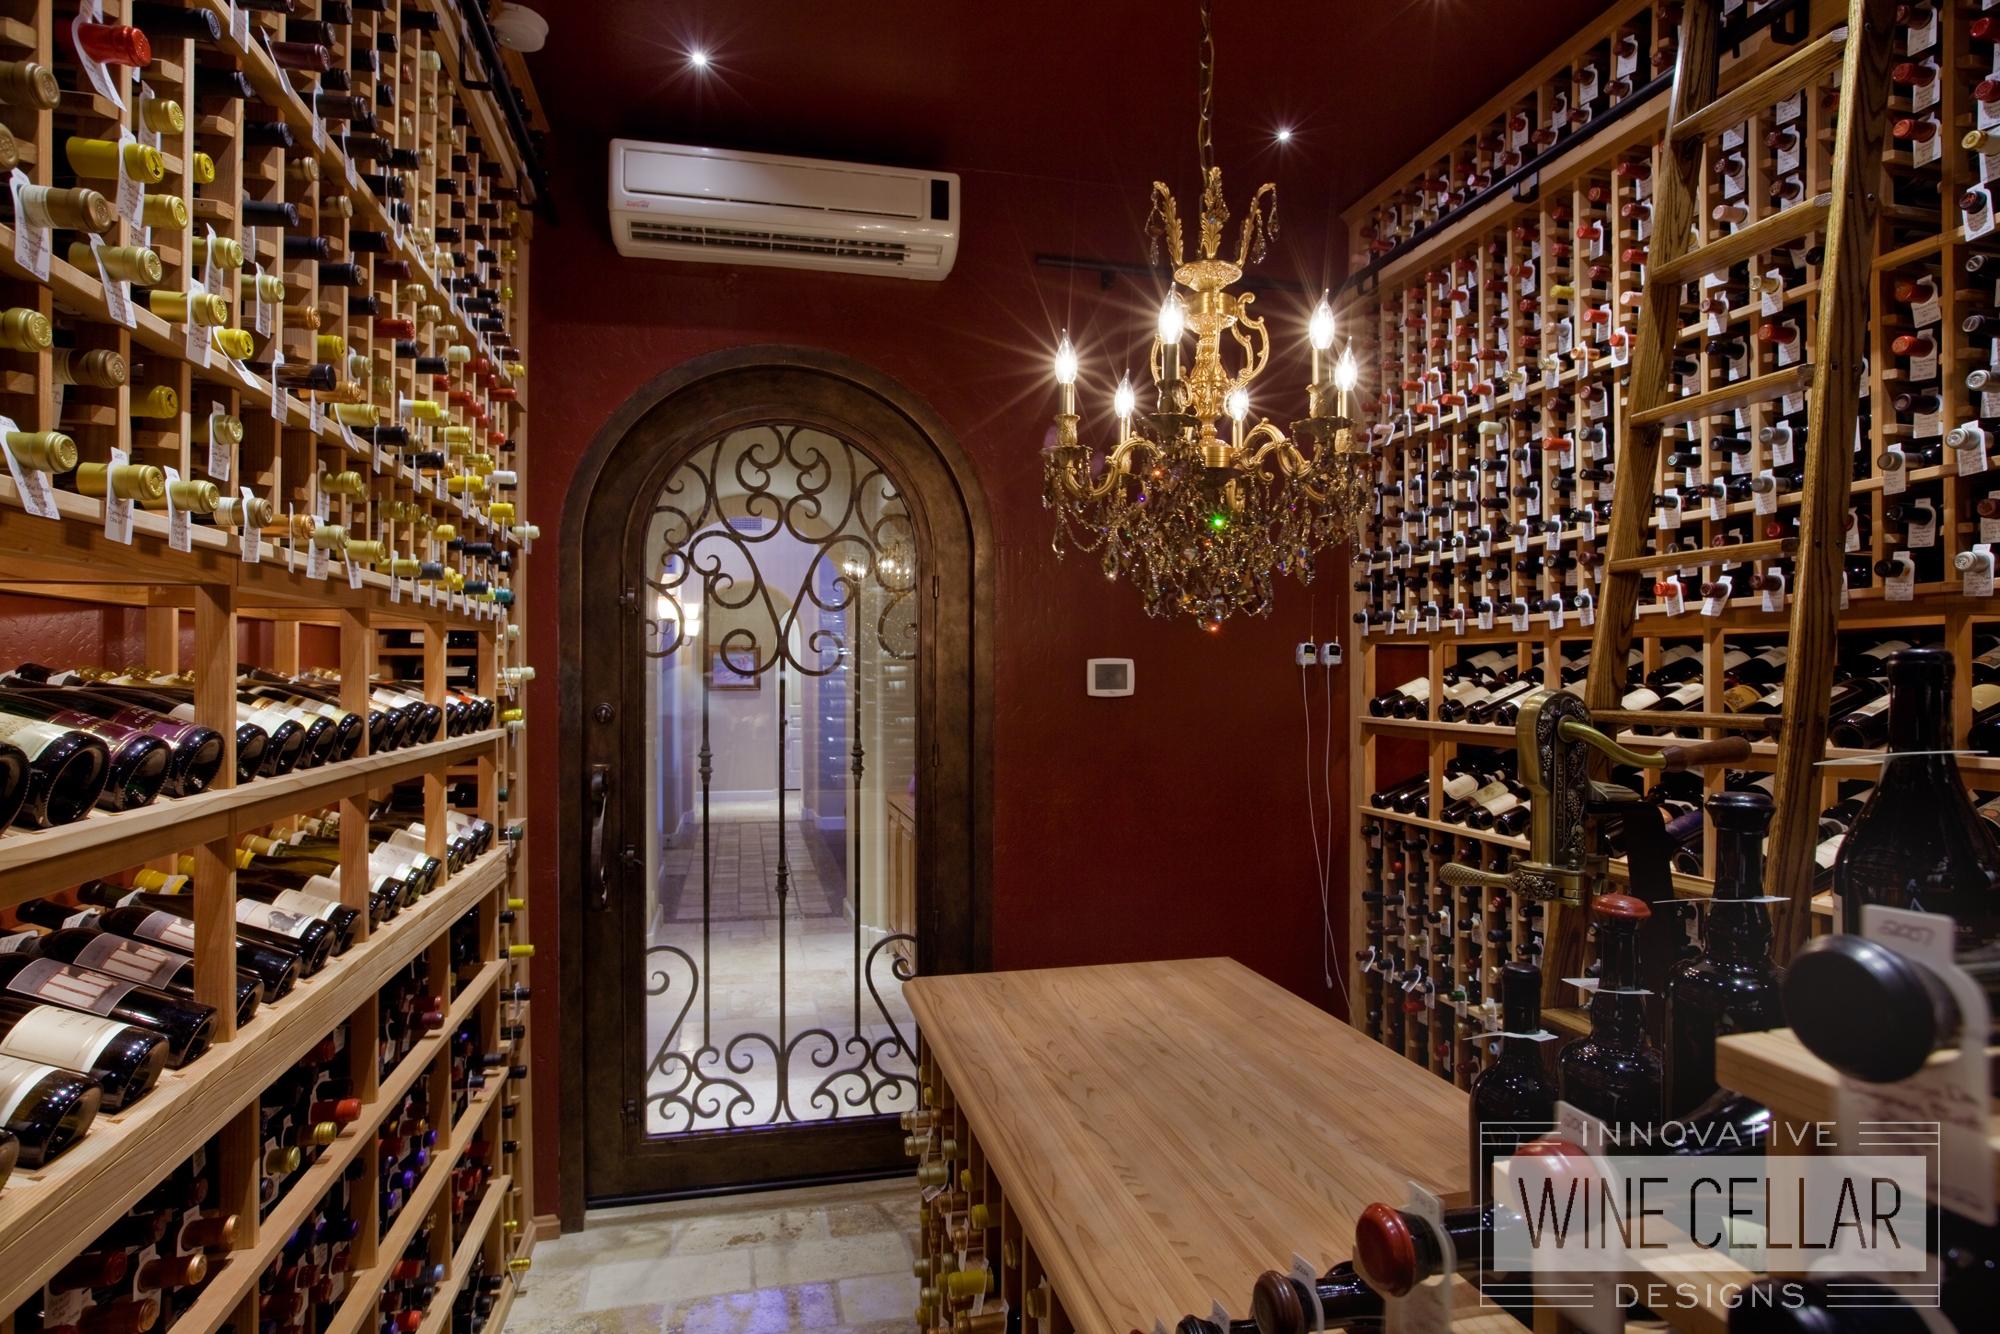 Floor to Ceiling Custom Wood Wine Racks in Temperature Controlled Wine Cellar